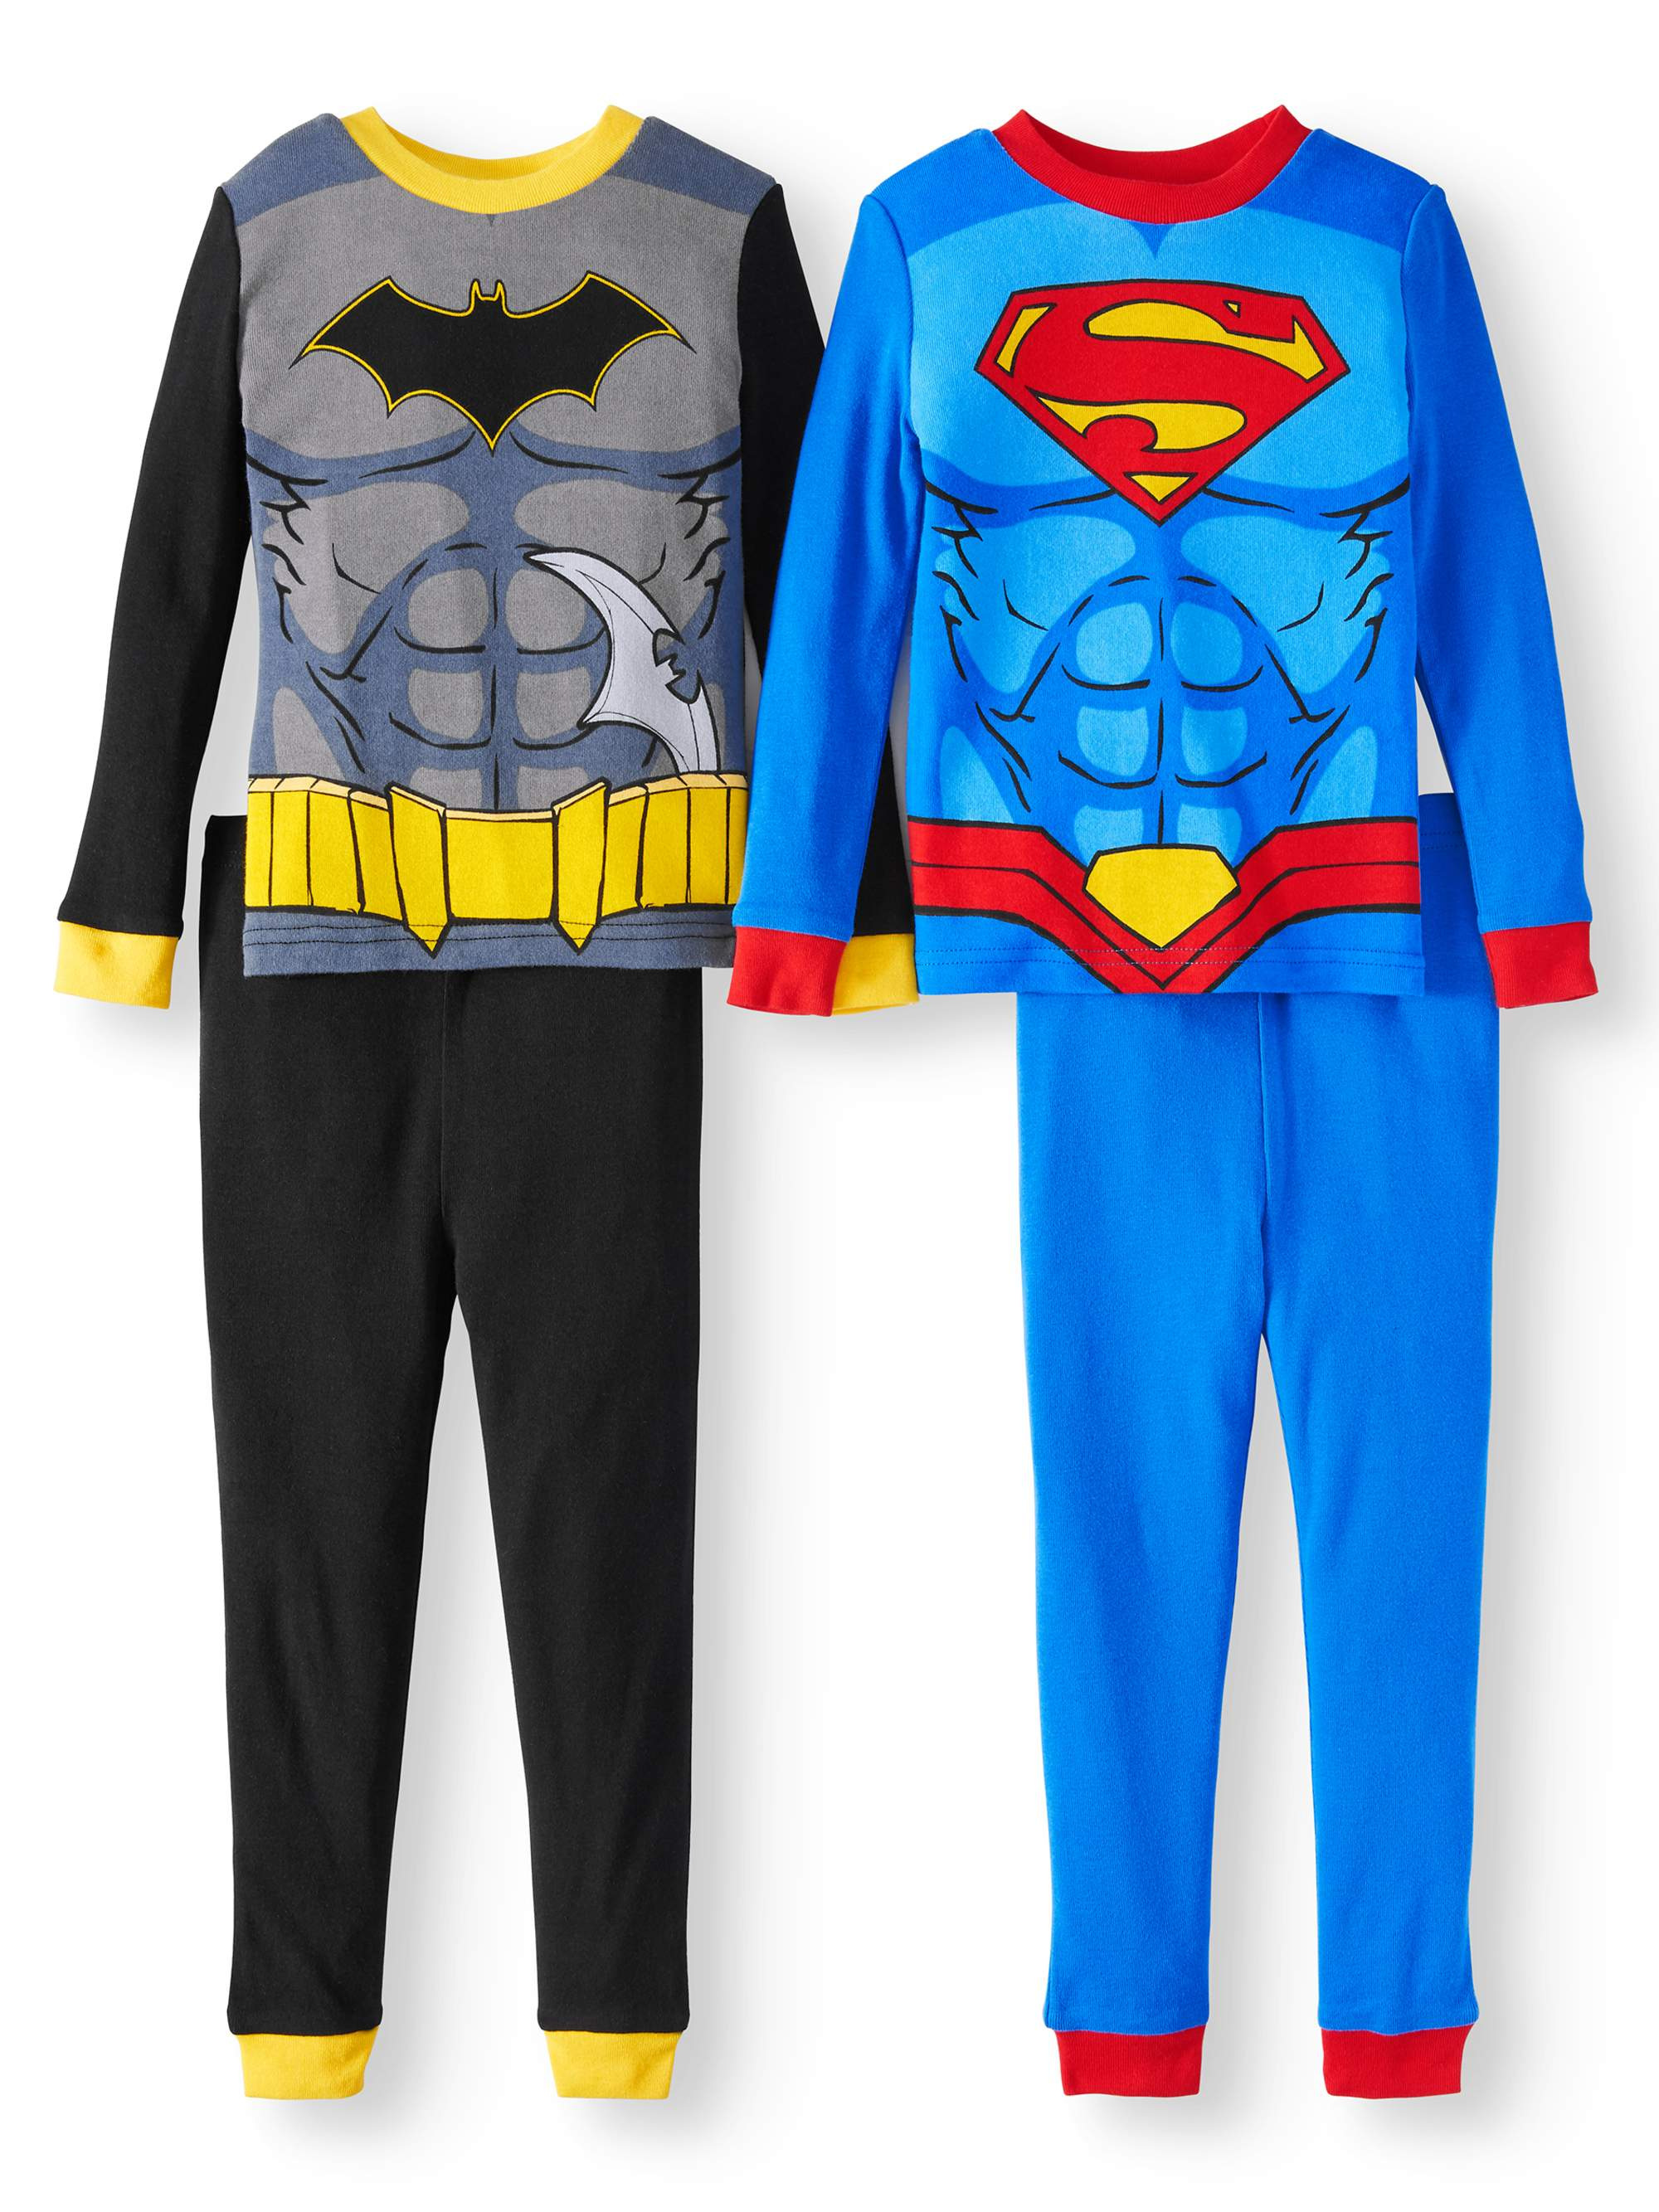 New Toddler Boys Knit 4 Piece Batman Pajama Set Size 5T